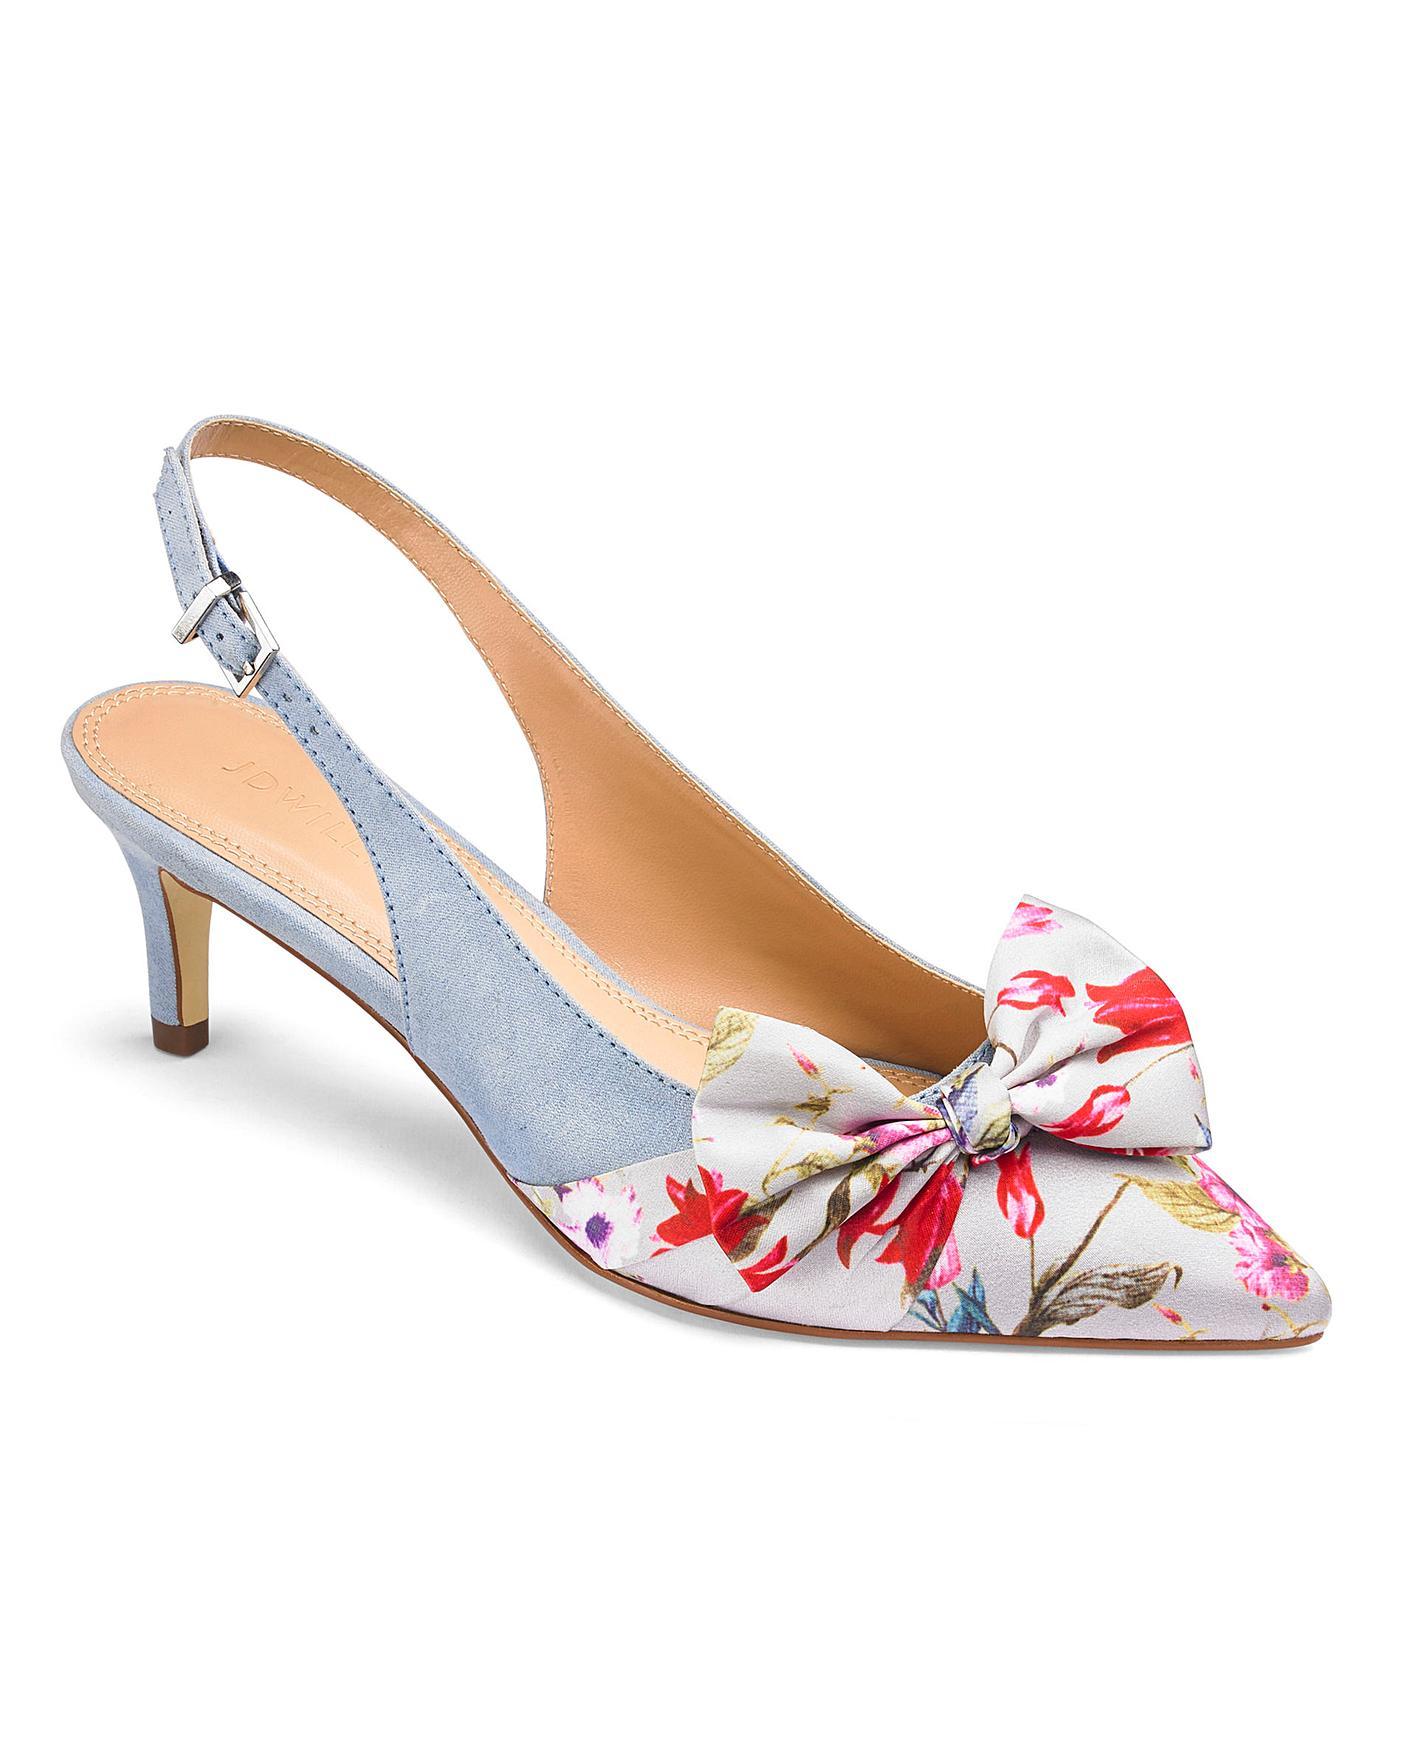 adbc5ec259 Joanna Hope Slingback Bow Shoes E Fit | Simply Be